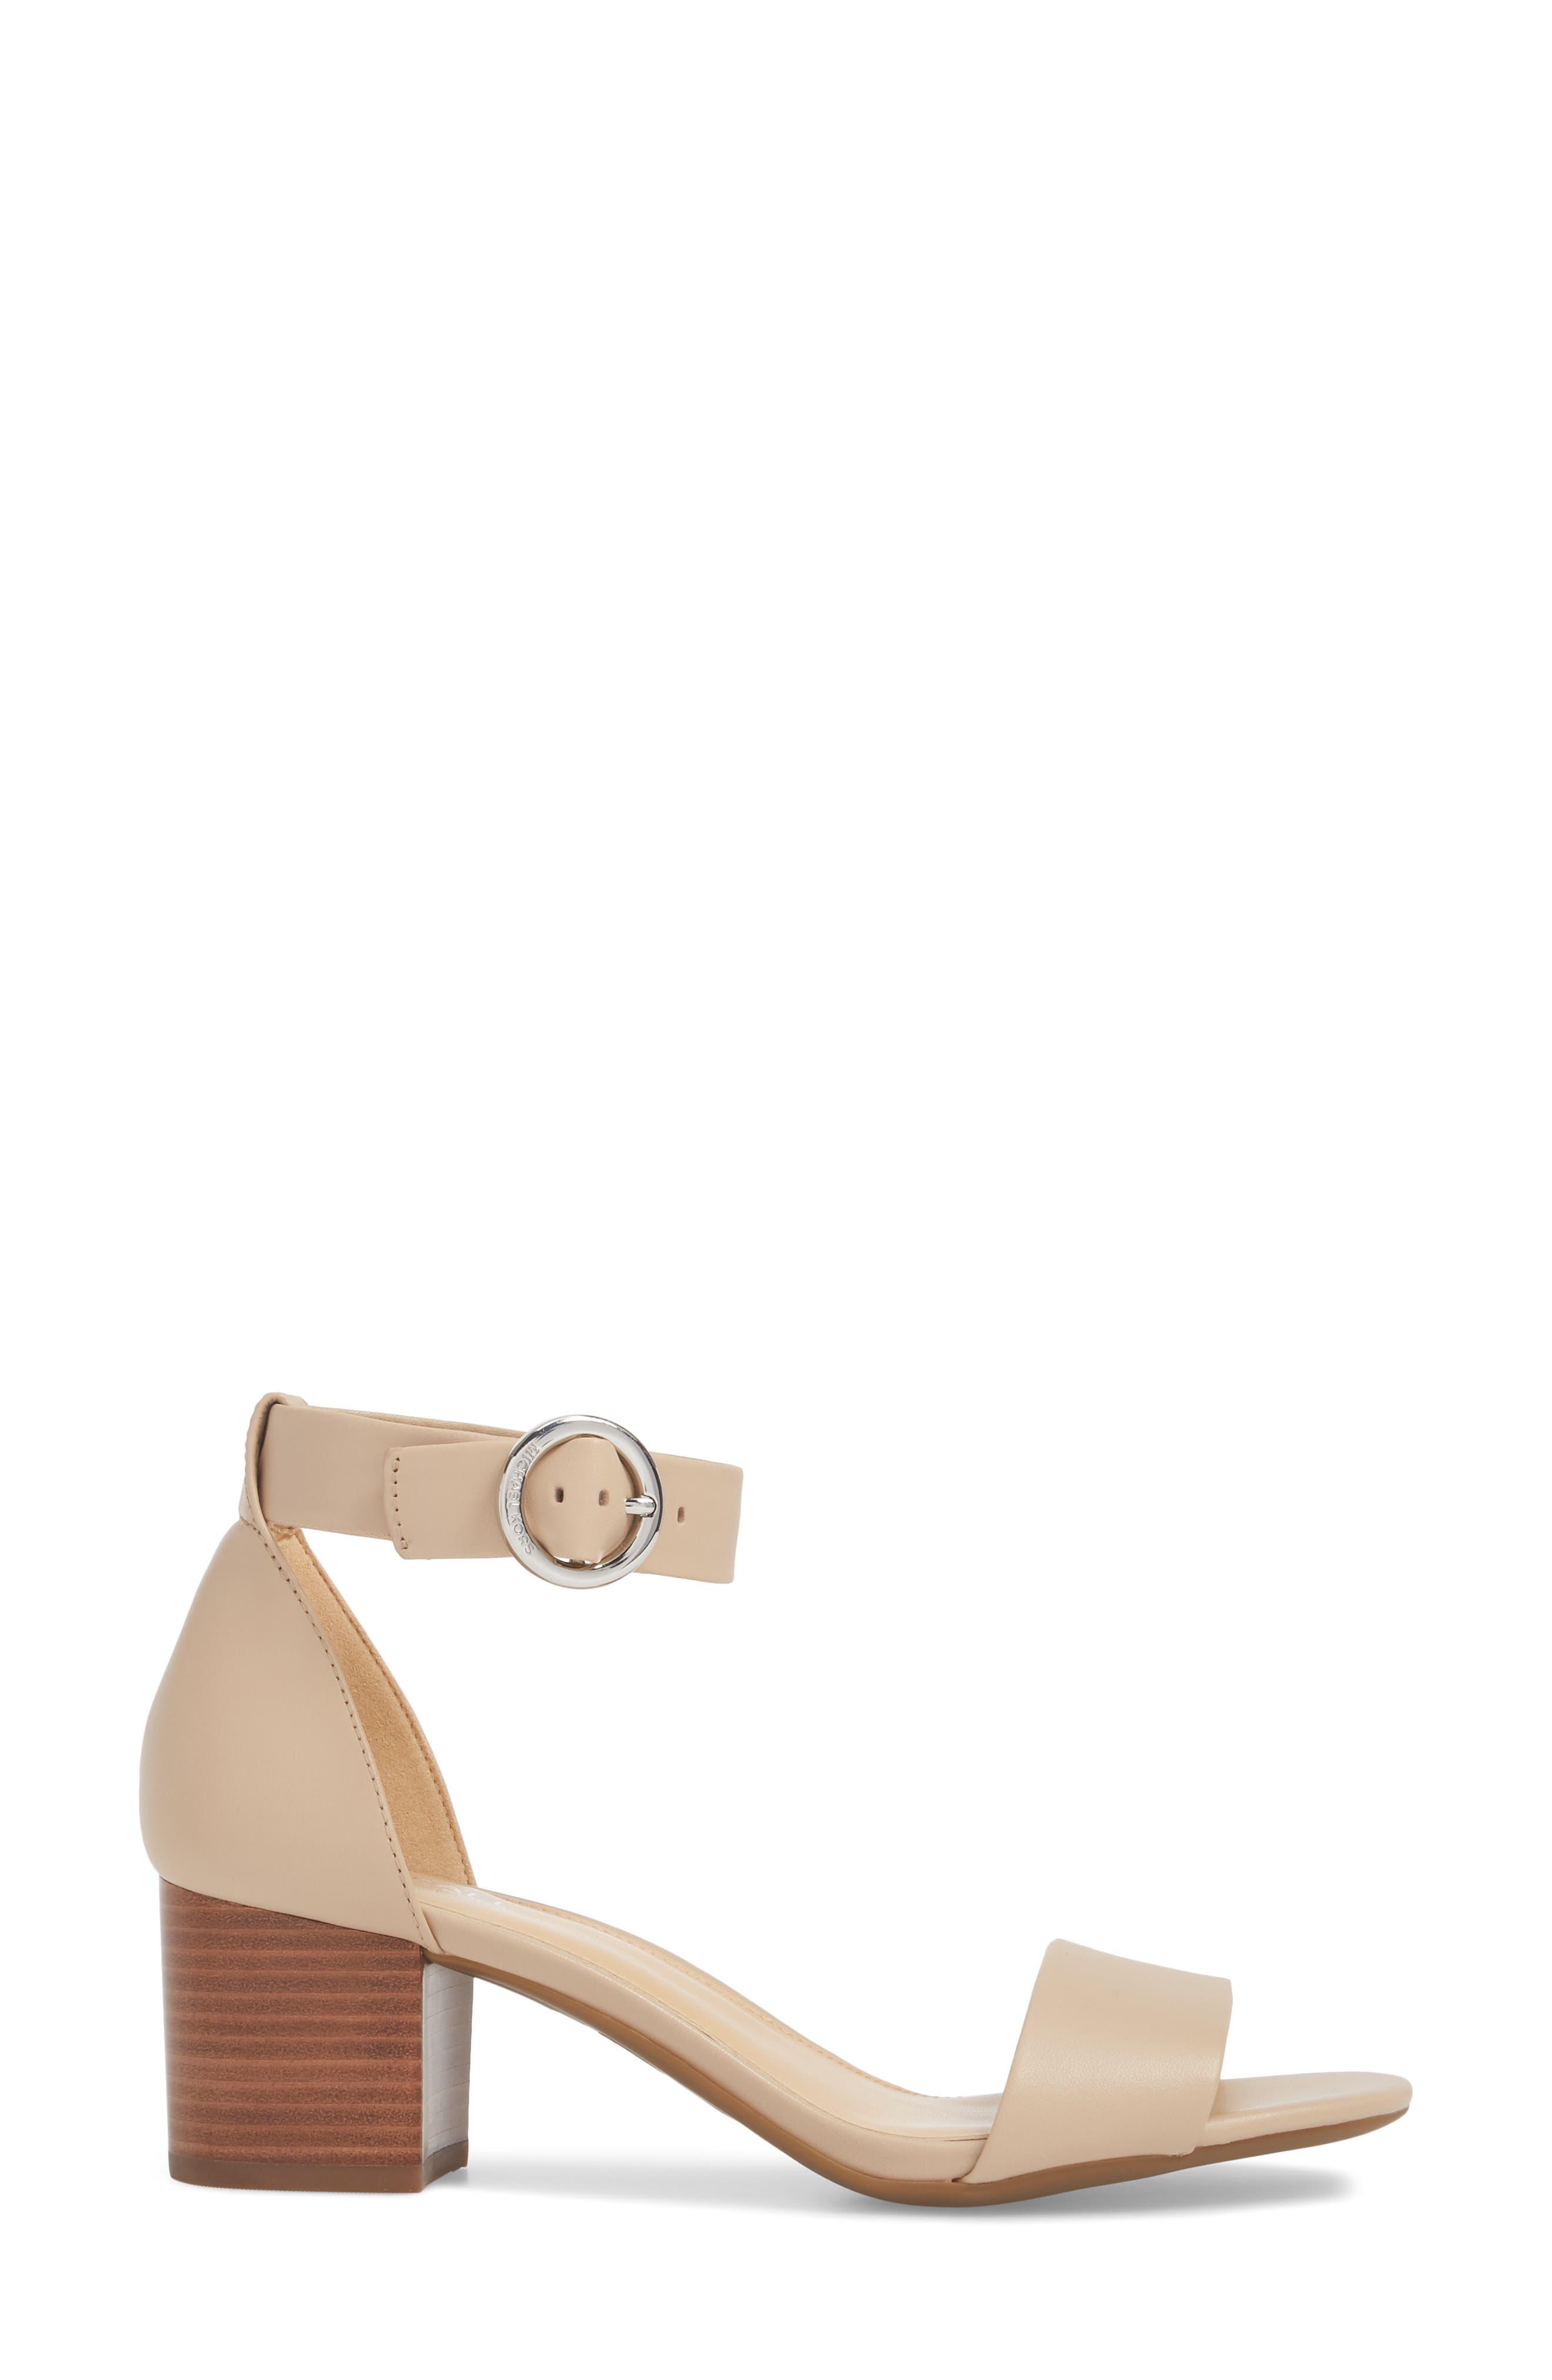 Lena Block Heel Sandal,                             Alternate thumbnail 3, color,                             Bisque